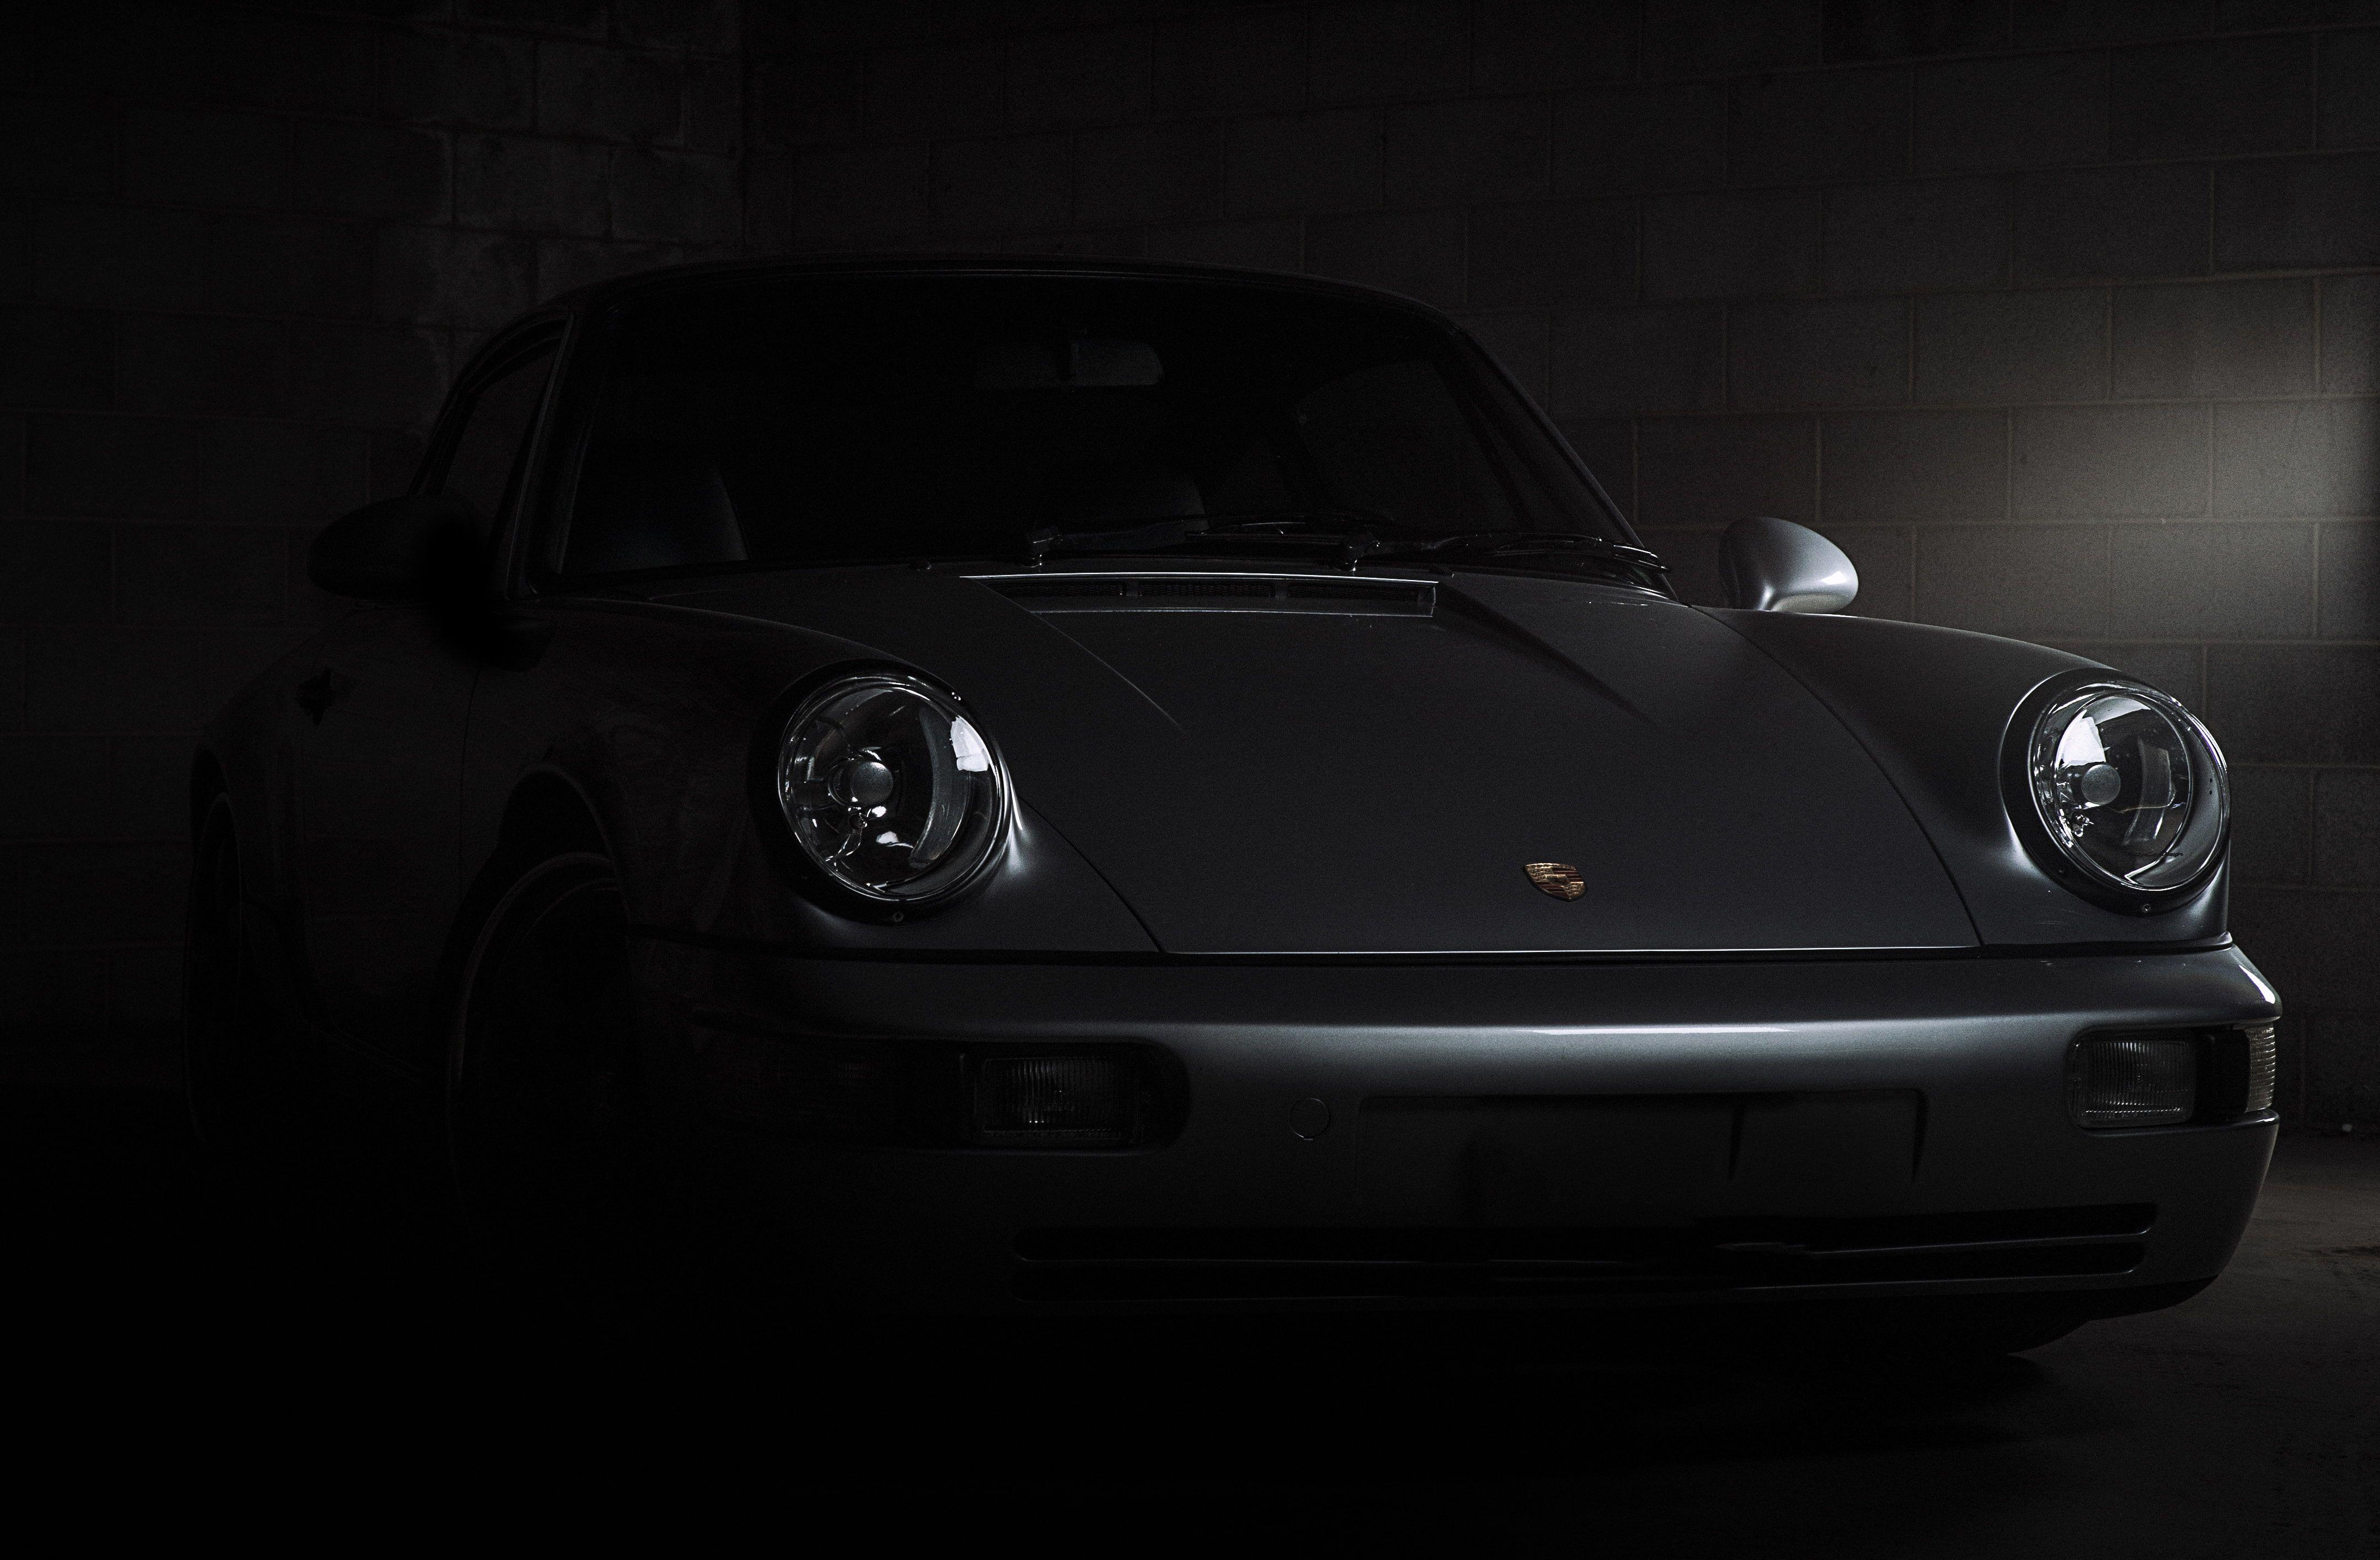 Pin By Gufak On Porsche Posters Black Car Wallpaper Old Porsche 911 Porsche 911